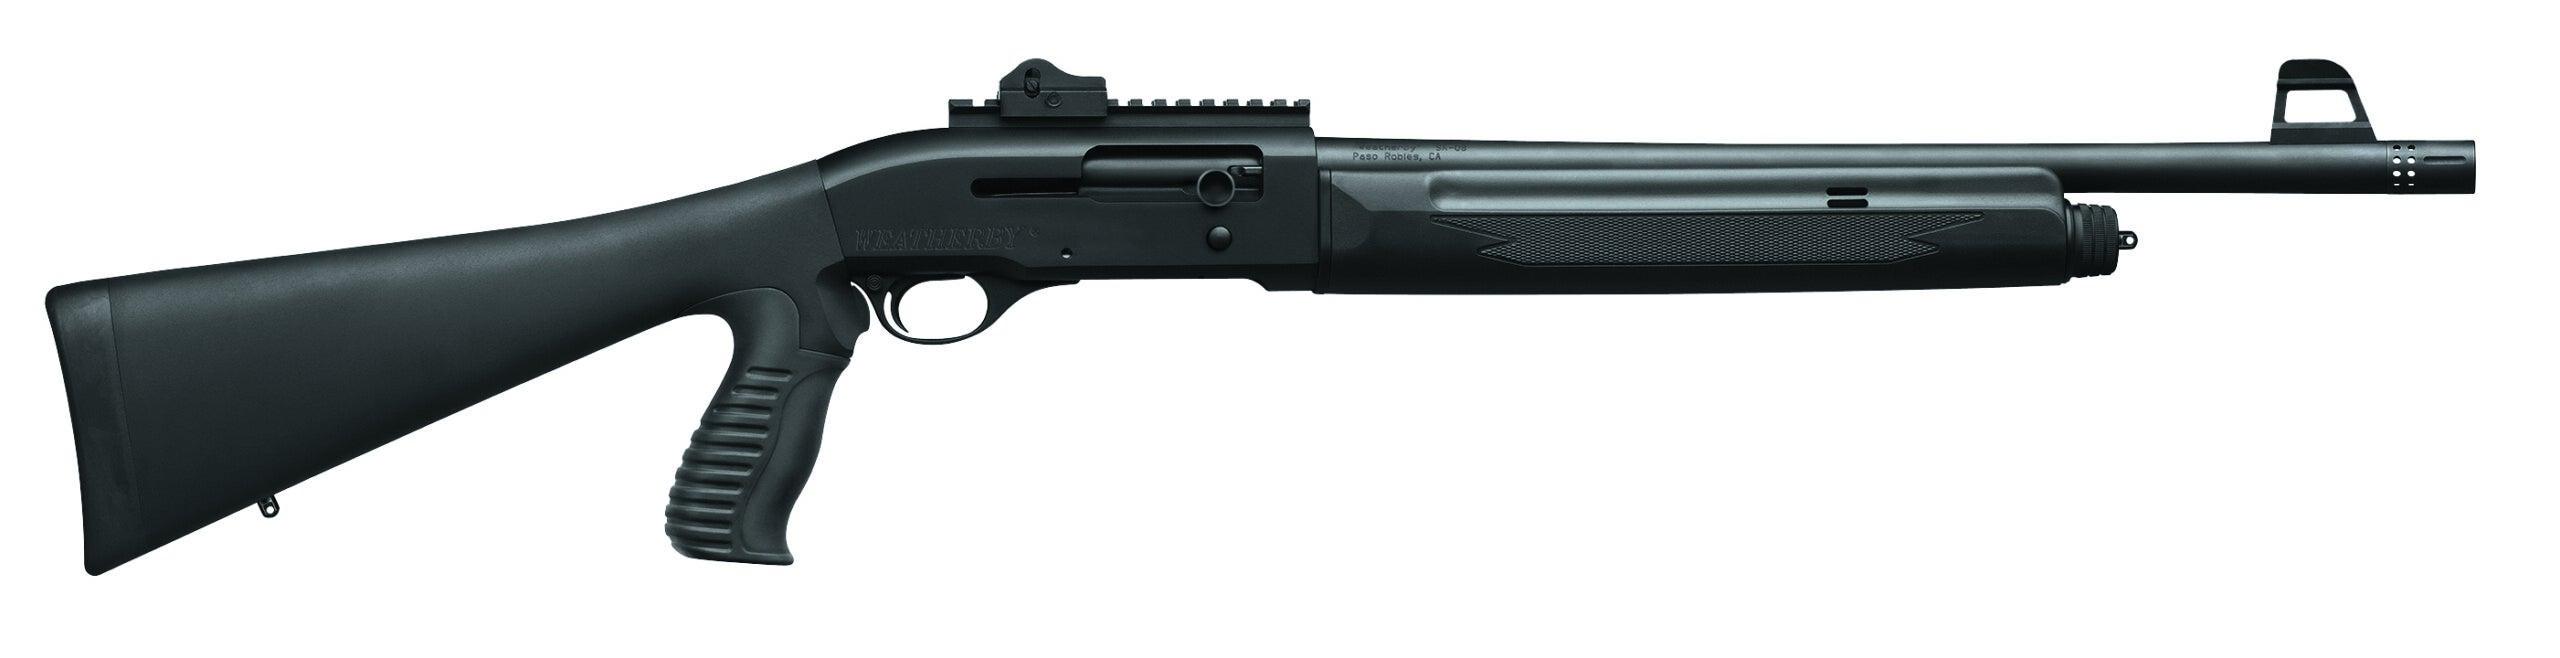 Tactical Shotgun: Is a 20 ga. Enough?